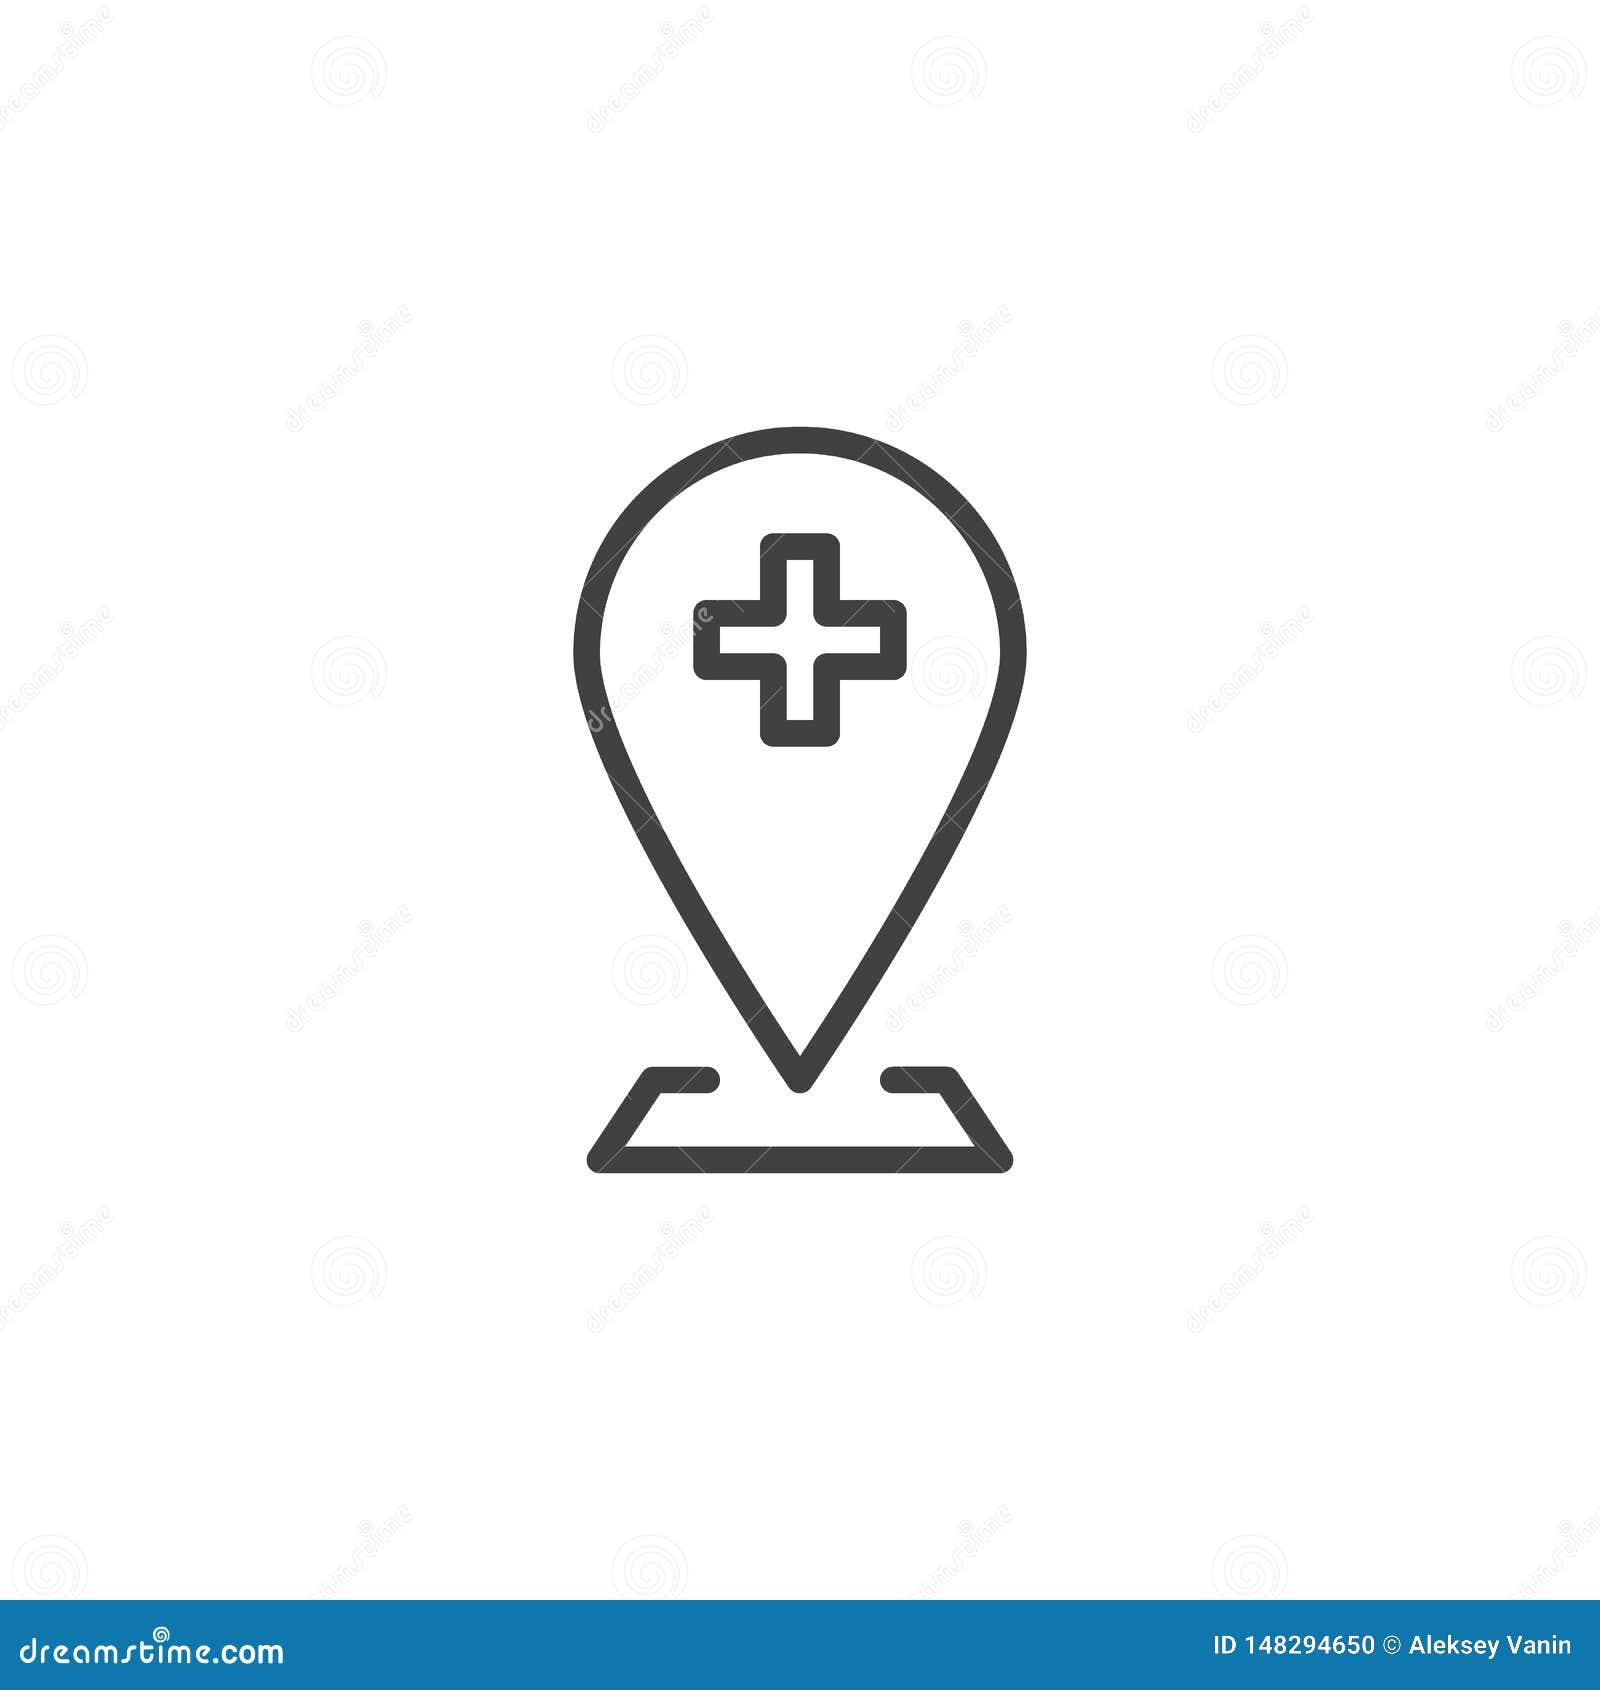 Hospital Location Pin Line Icon Stock Vector - Illustration